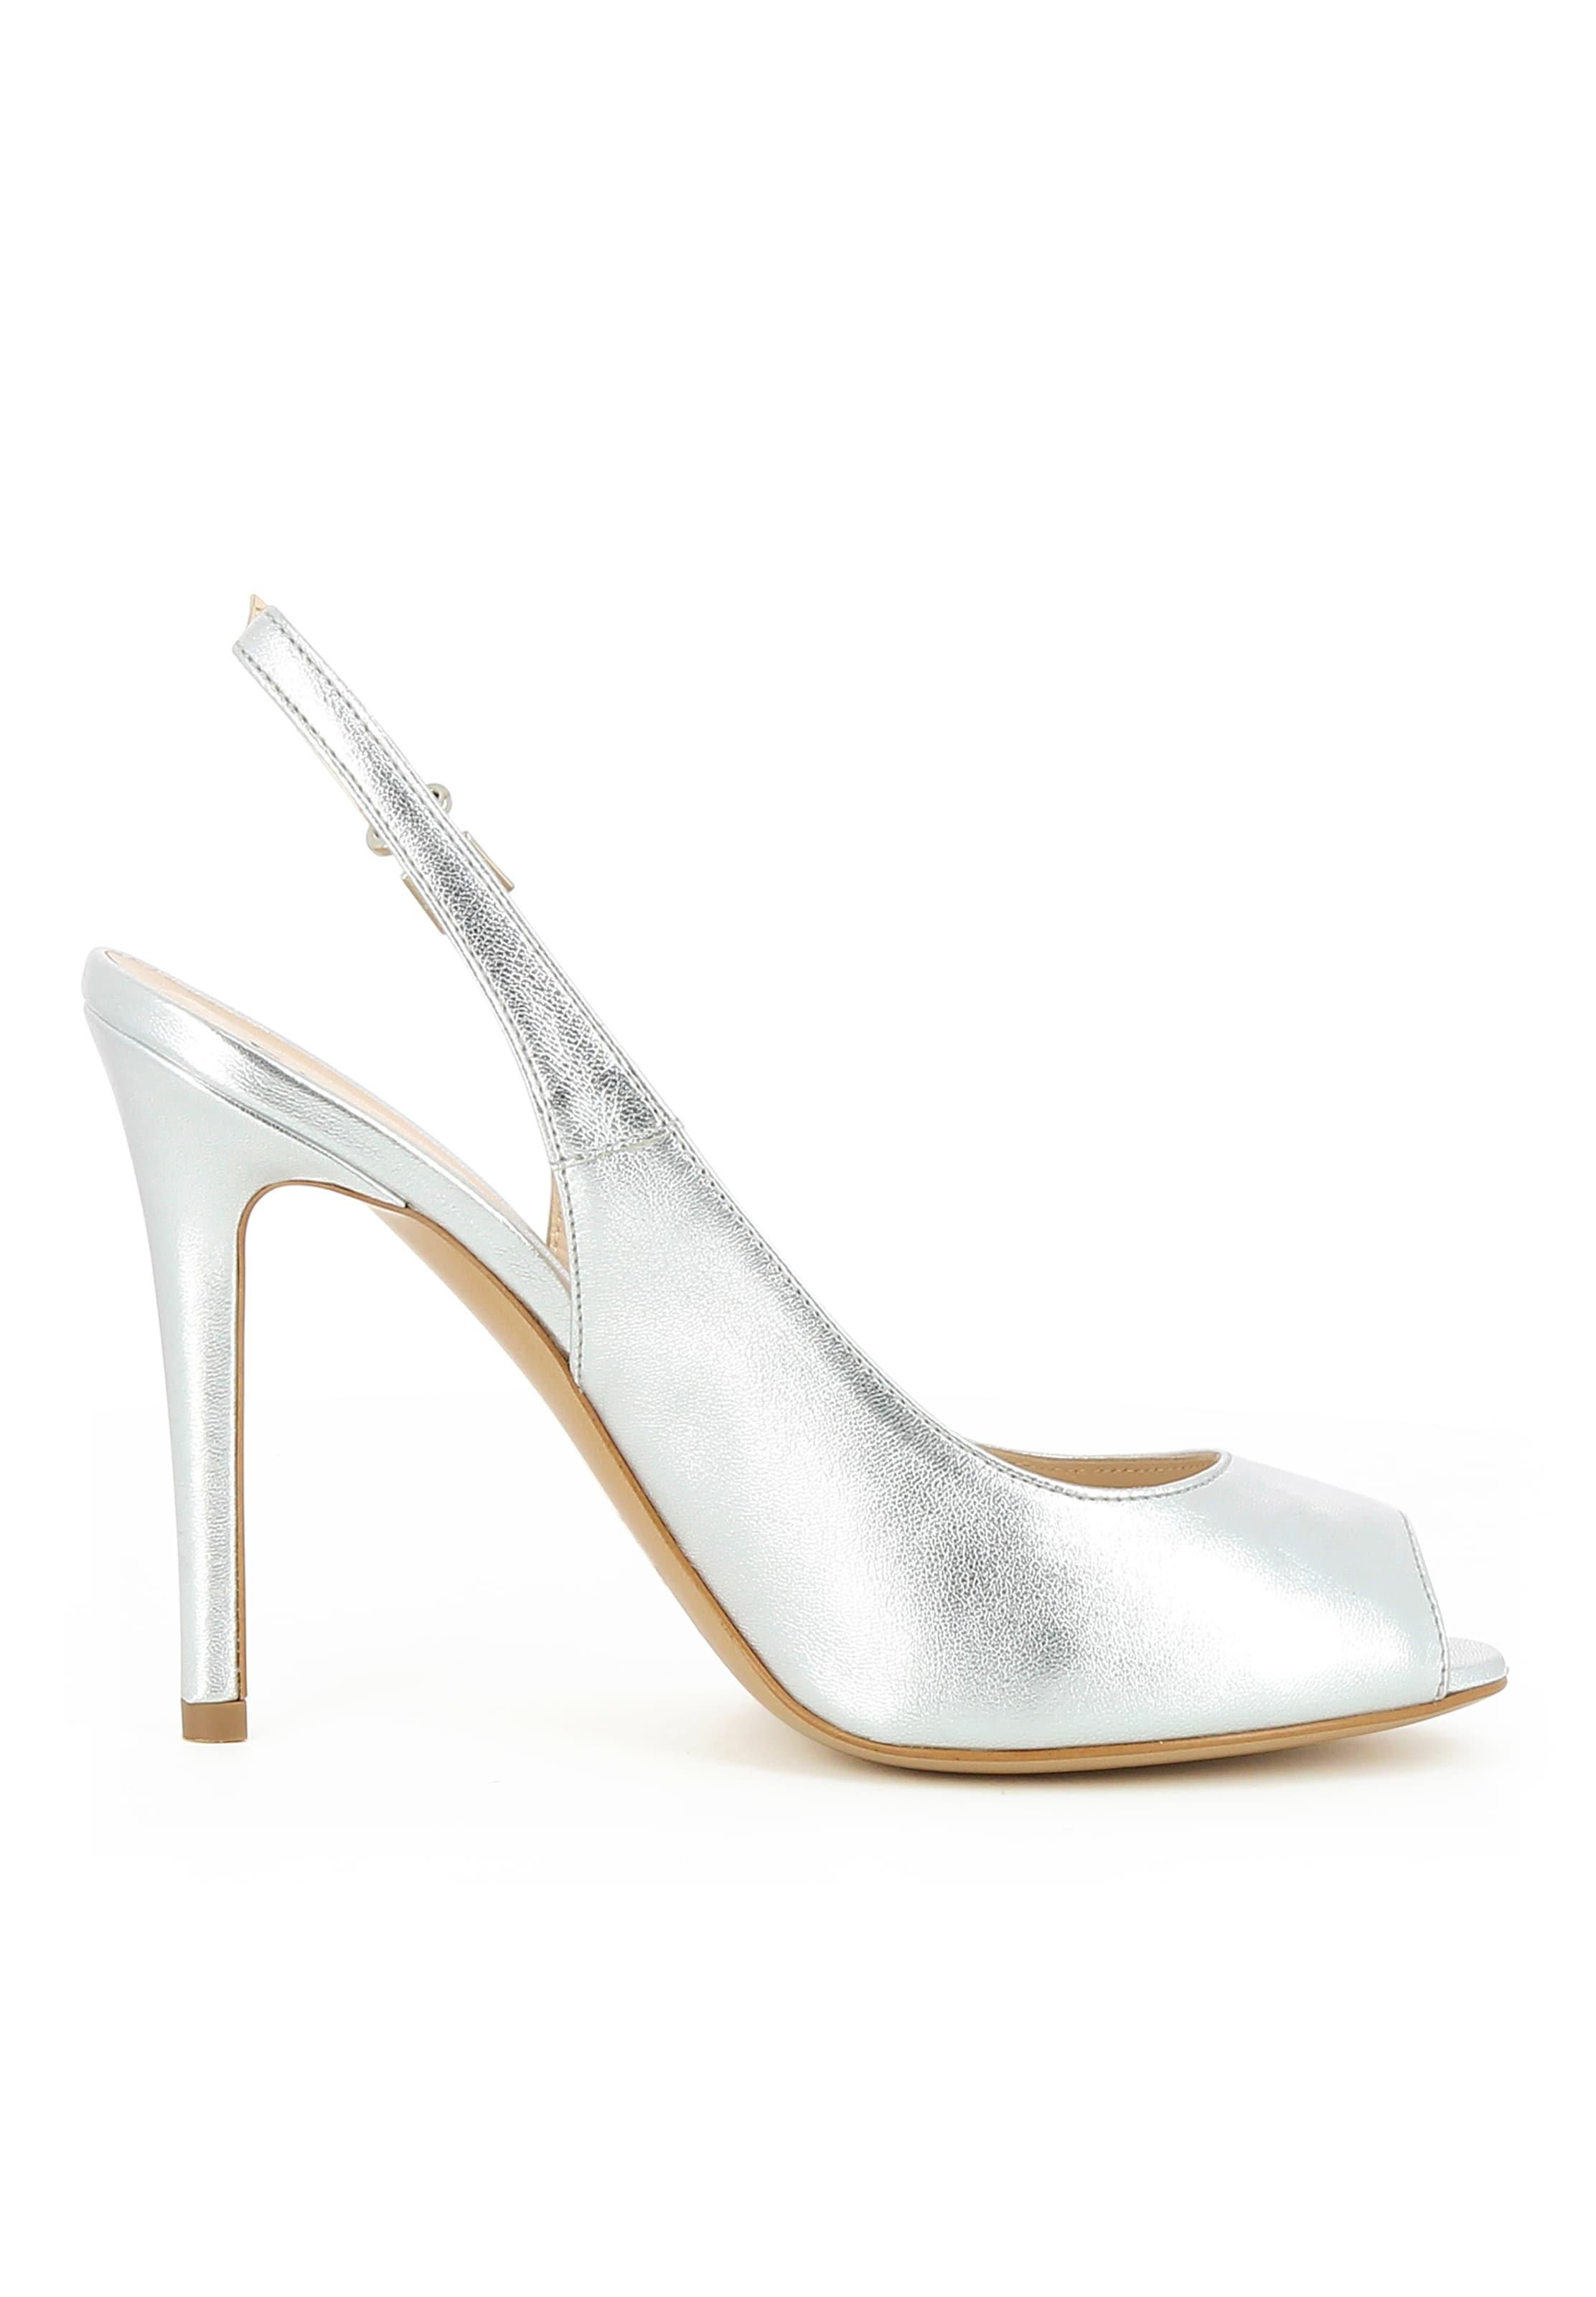 Silber Sandalette Silber 'alessandra' Evita 'alessandra' In Evita In Sandalette Evita 'alessandra' Sandalette In 1JTlFcK3